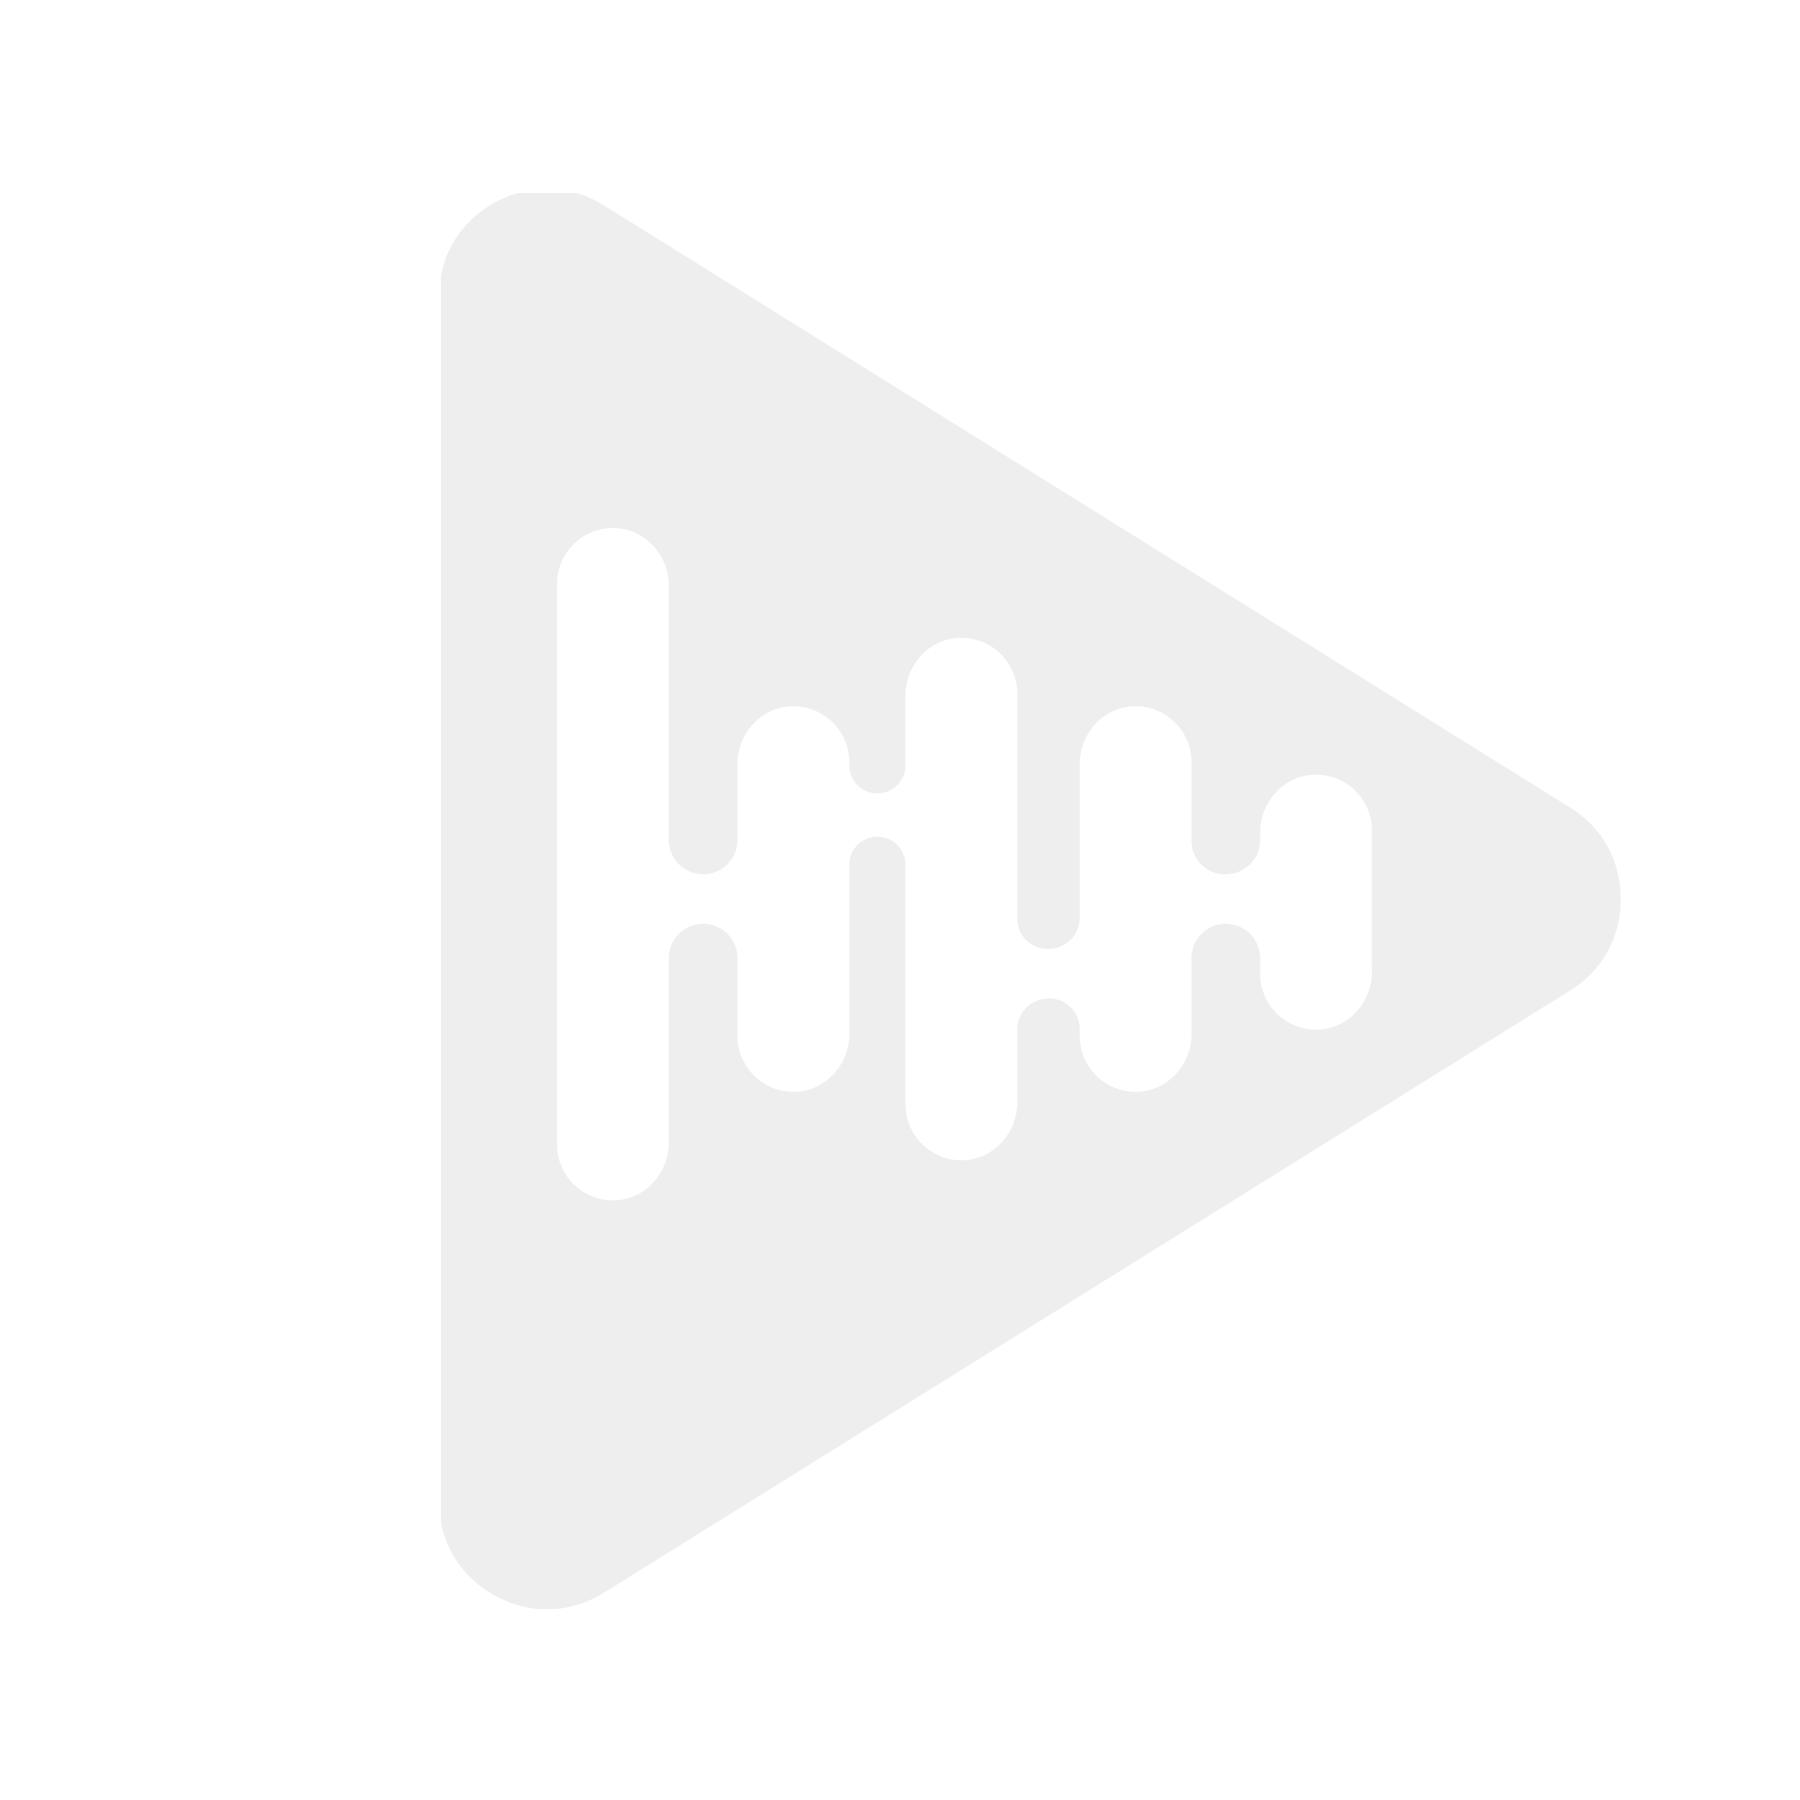 Skoddejuice Cola Aroma